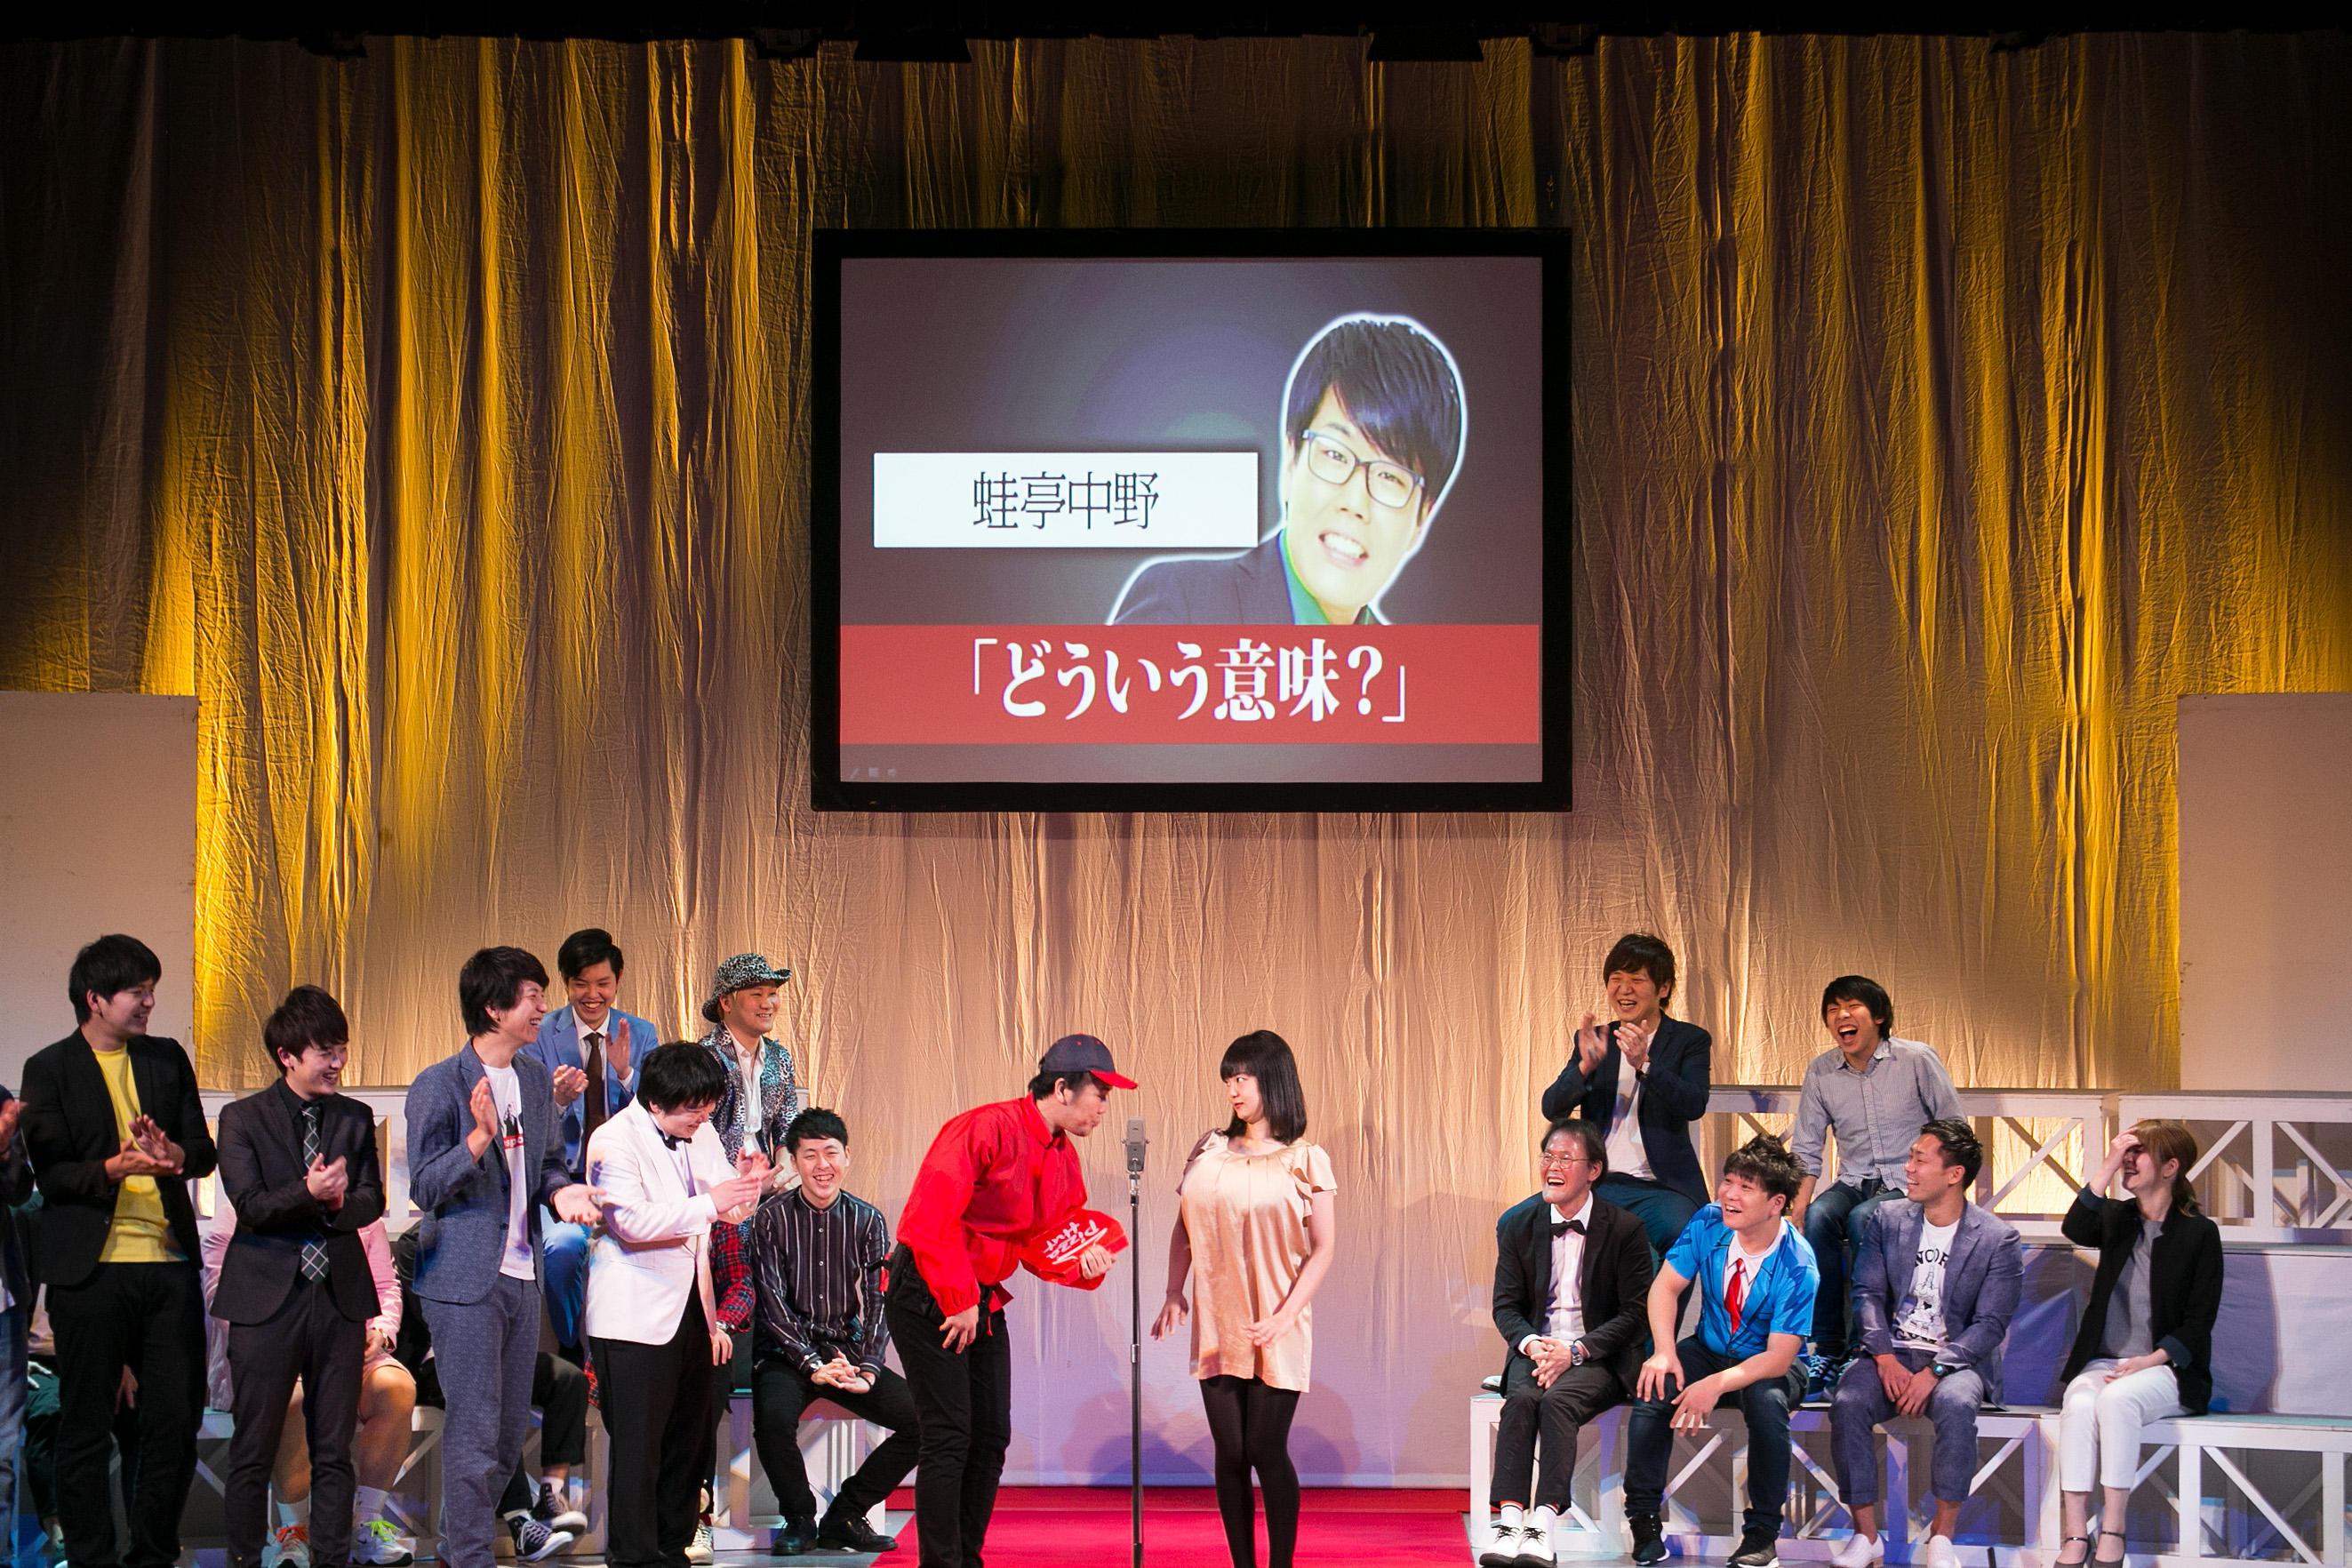 http://news.yoshimoto.co.jp/20181228111617-2f114b7ec6047bc68720834c1dd49111e20aeb20.jpg